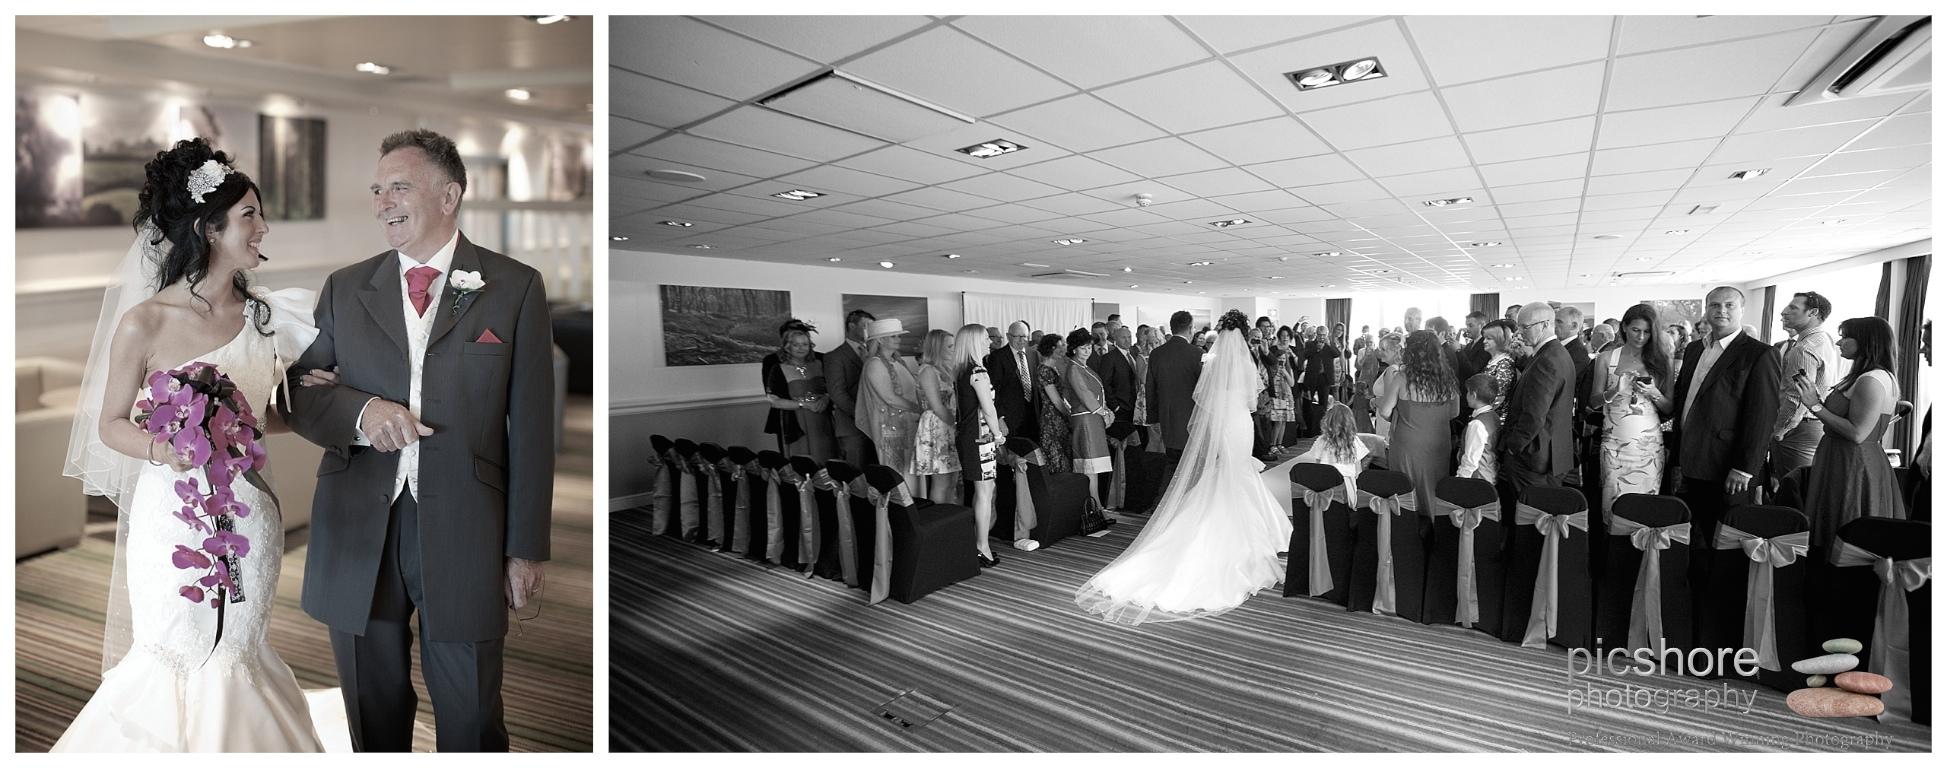 st mellion cornwall wedding picshore photography 3